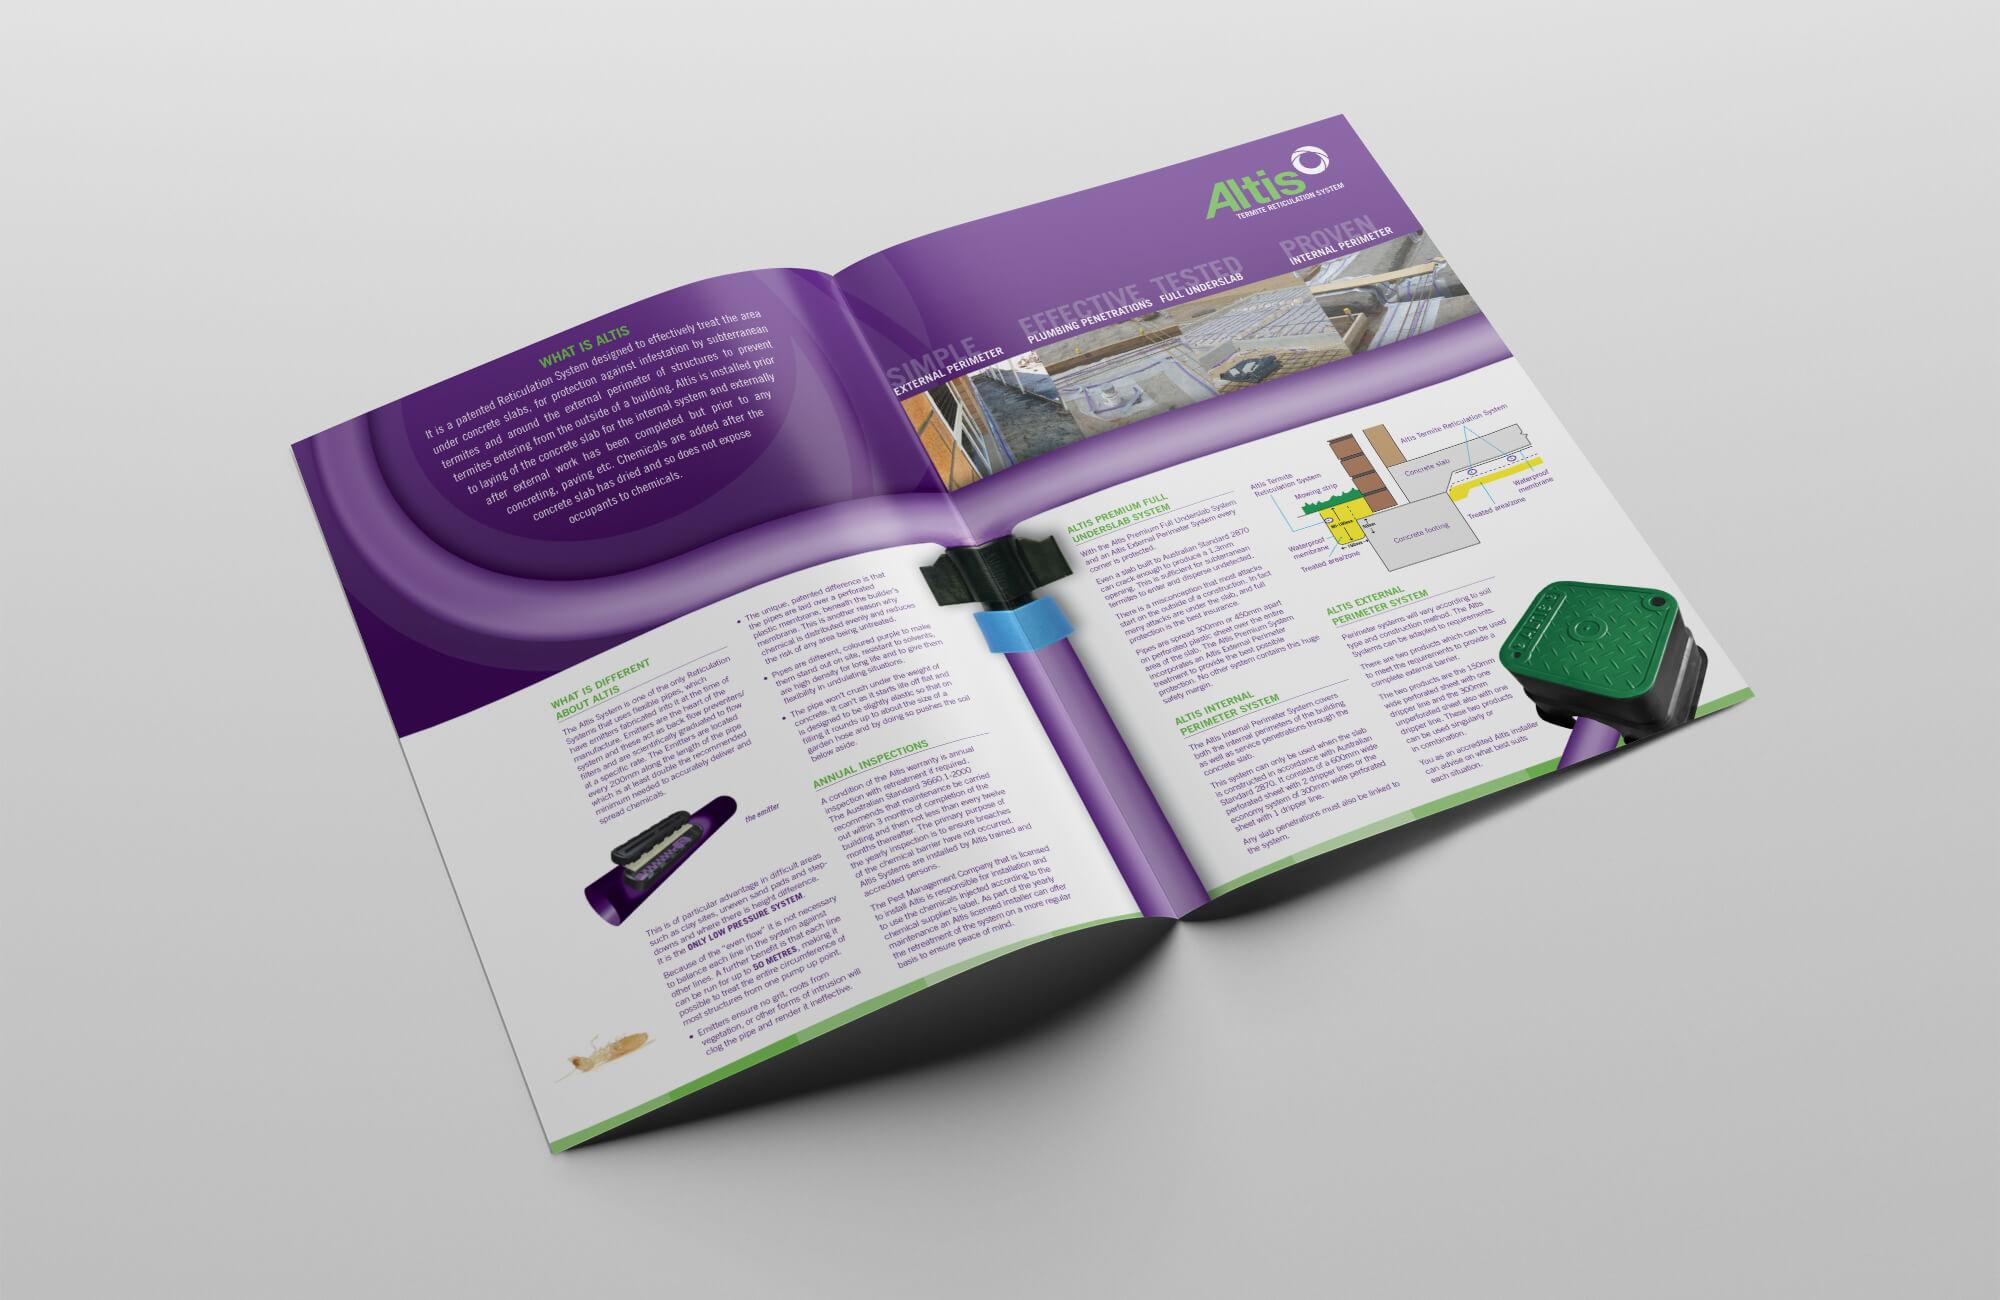 Print Design - Mezzanine Design | Graphic Design, Print